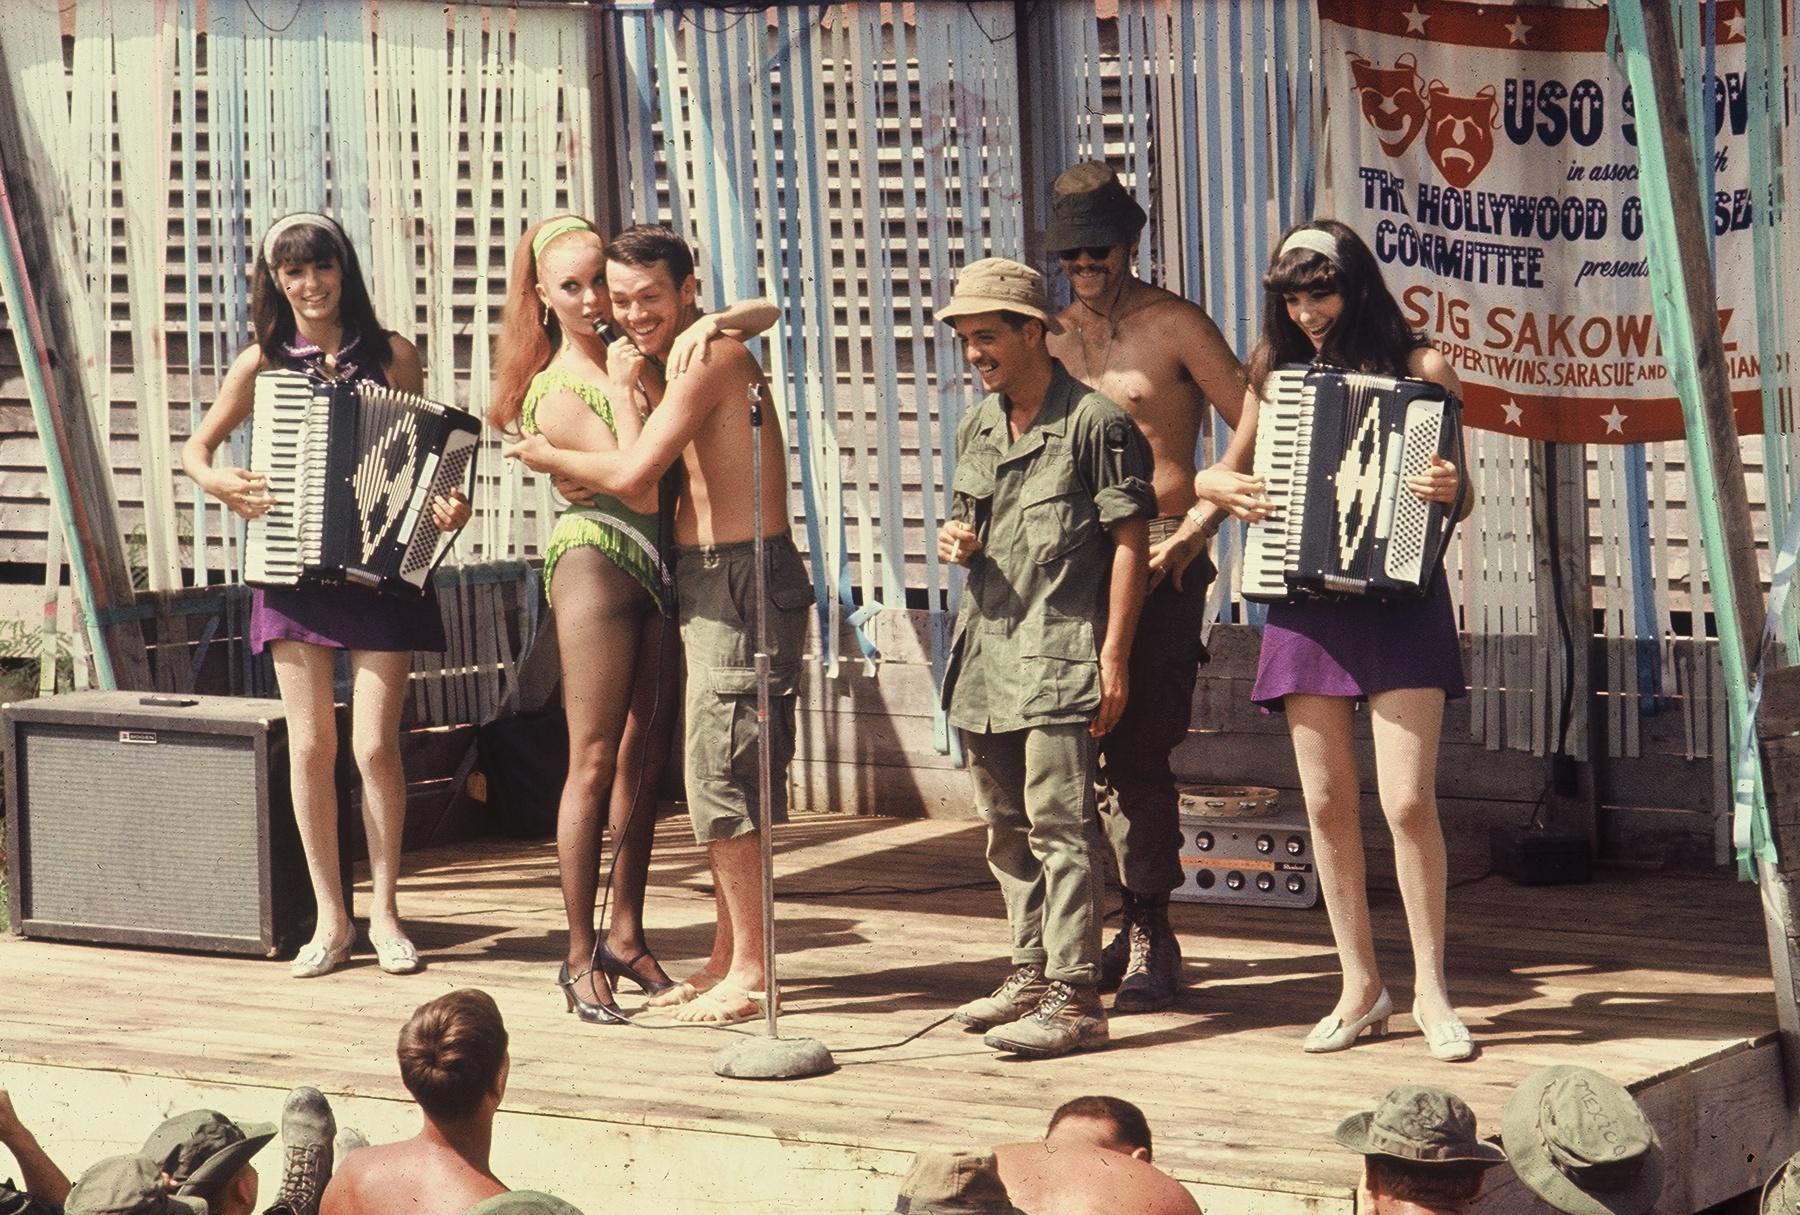 uso_show_vietnam_1968_terrie_frankel_sara_sue_3_soldiers_jennie_frankel.jpg